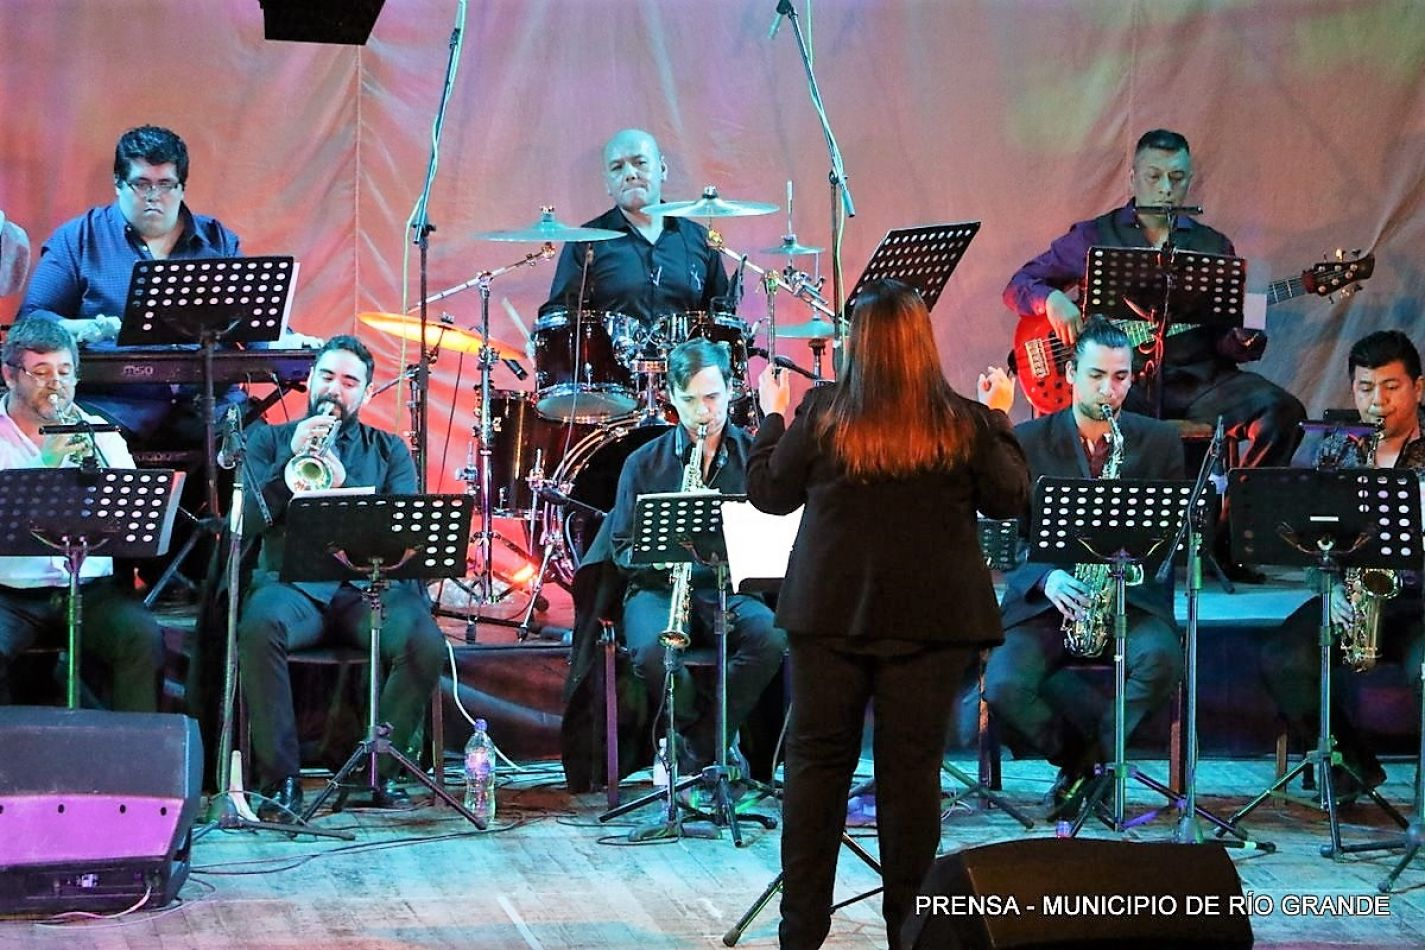 La banda de música ofreció un concierto en la Casa de la Cultura.